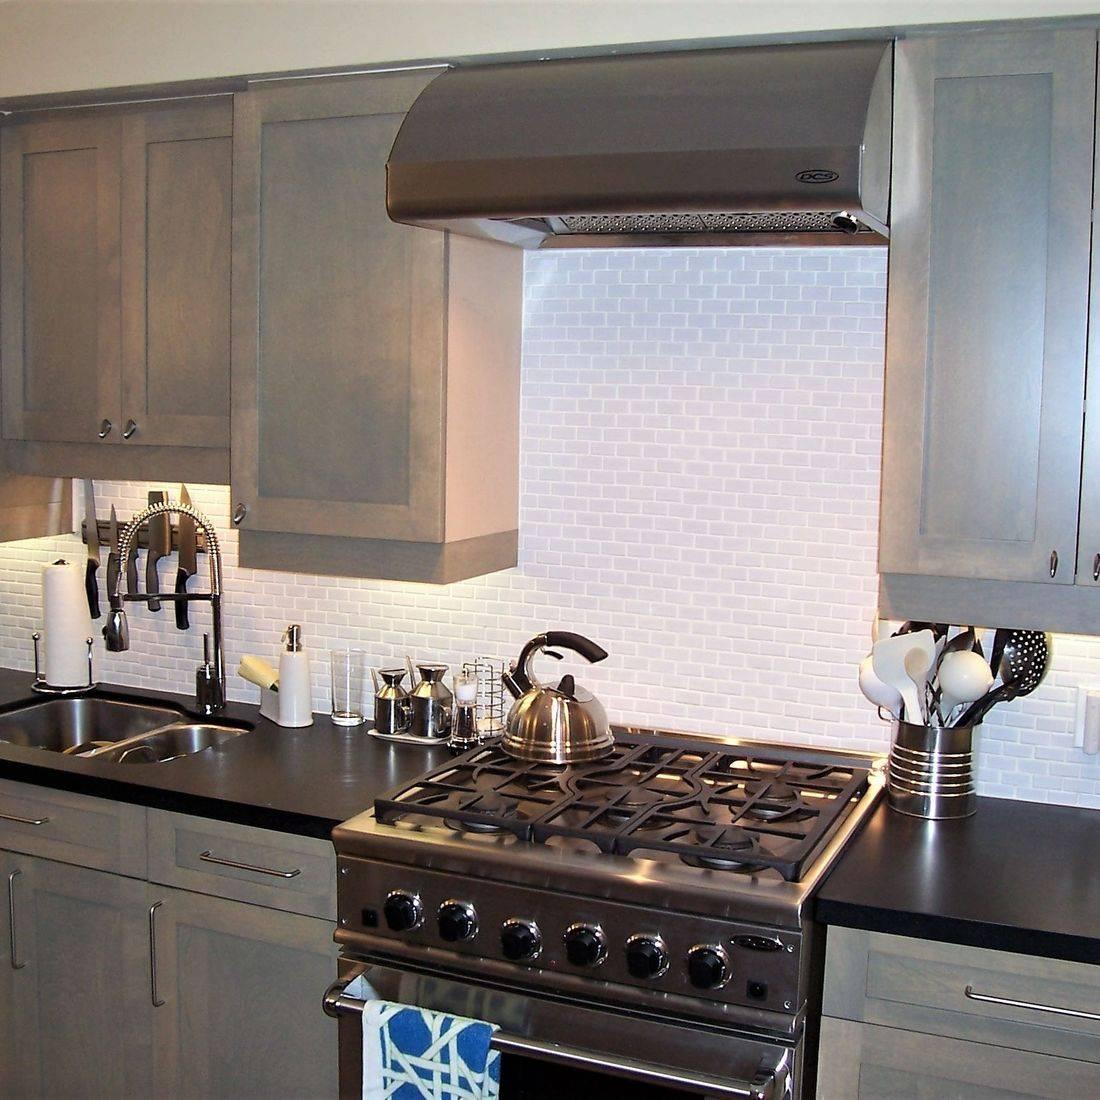 Sibra Kitchens Markham Toronto cabinets HGTV